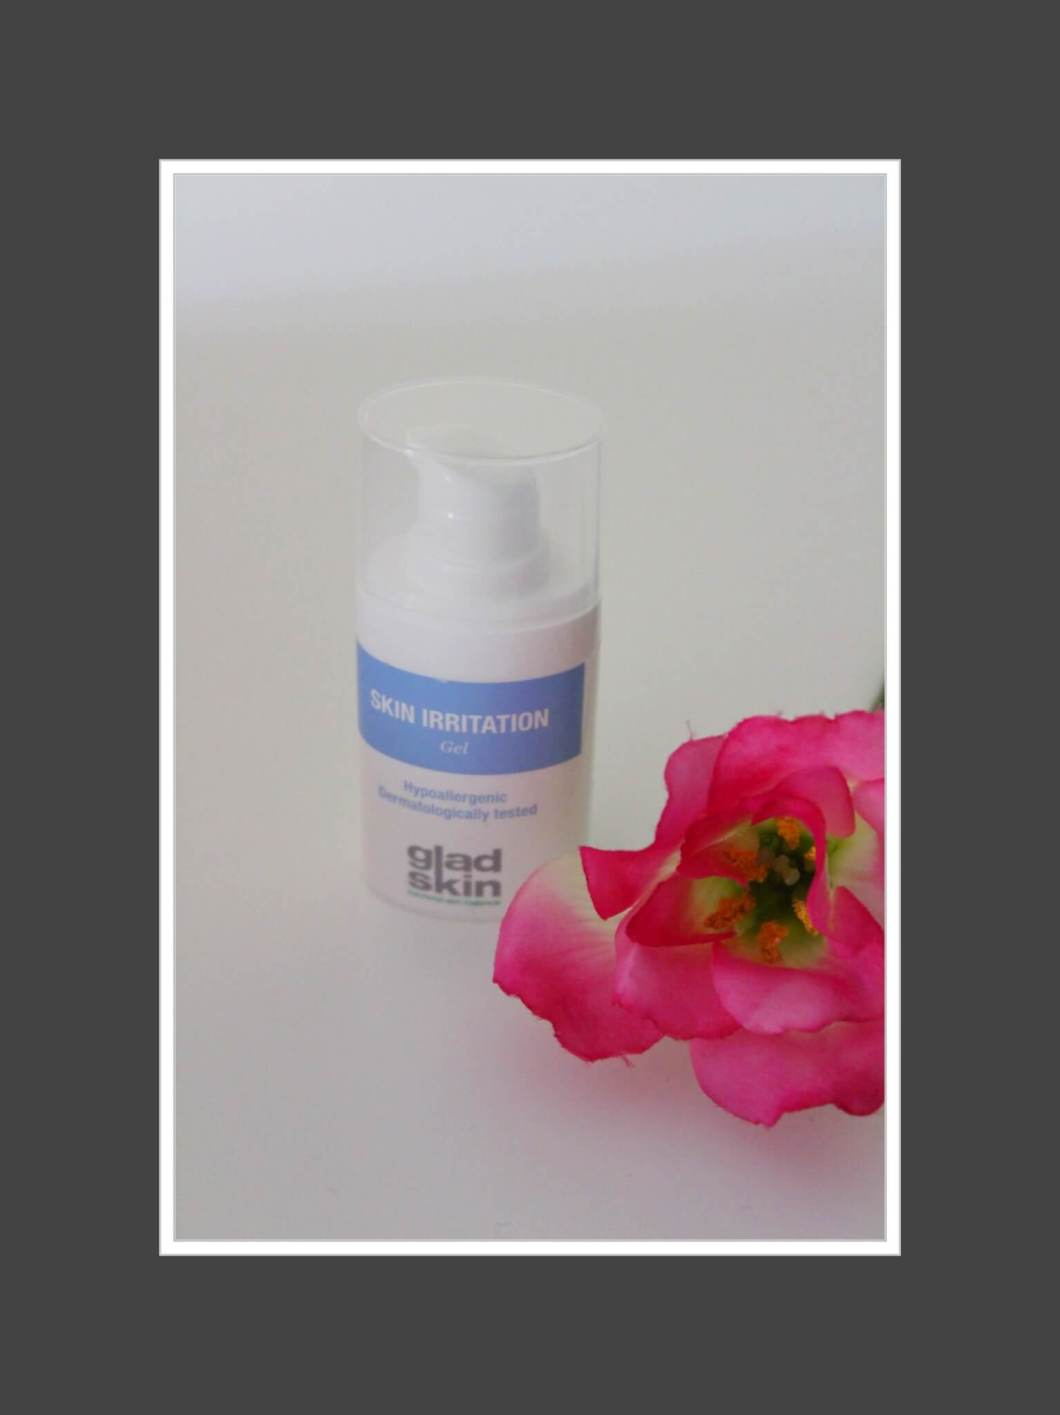 gladskin skin irritation gel